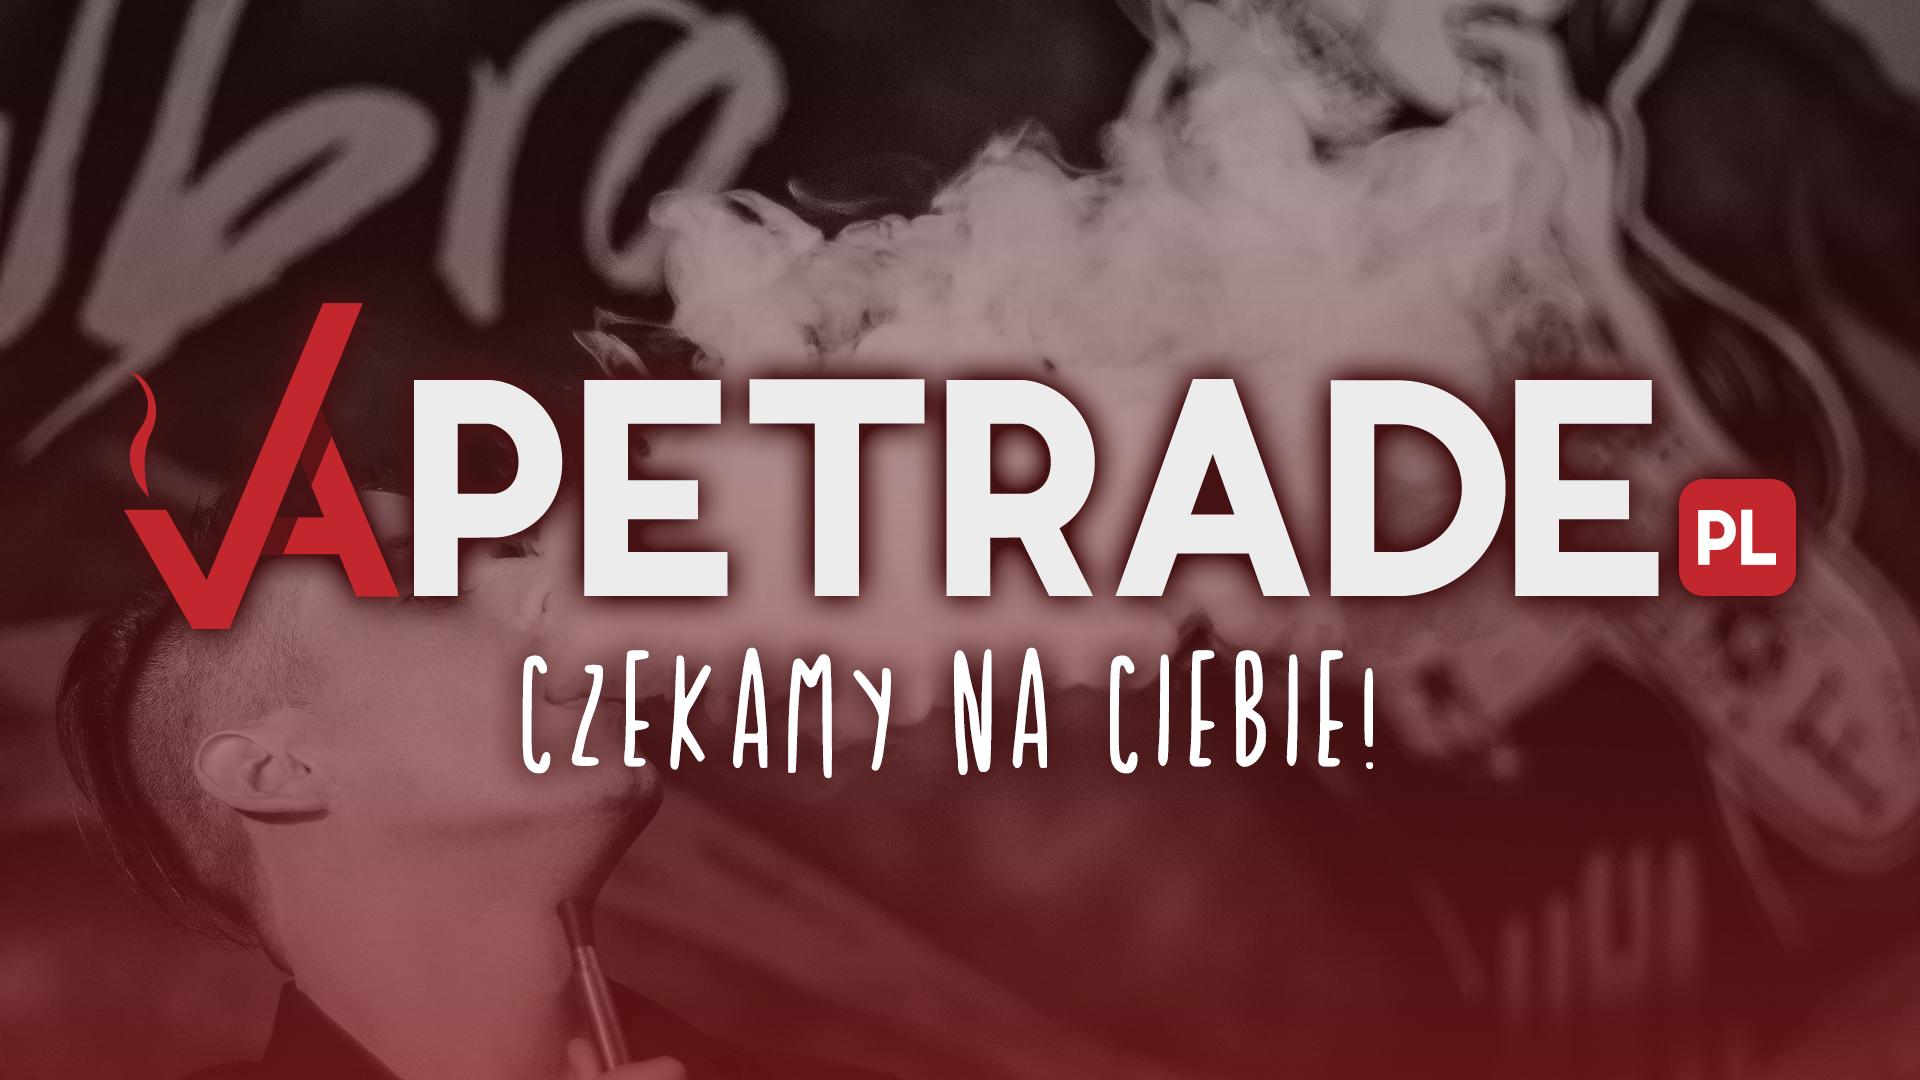 vapetrade.pl